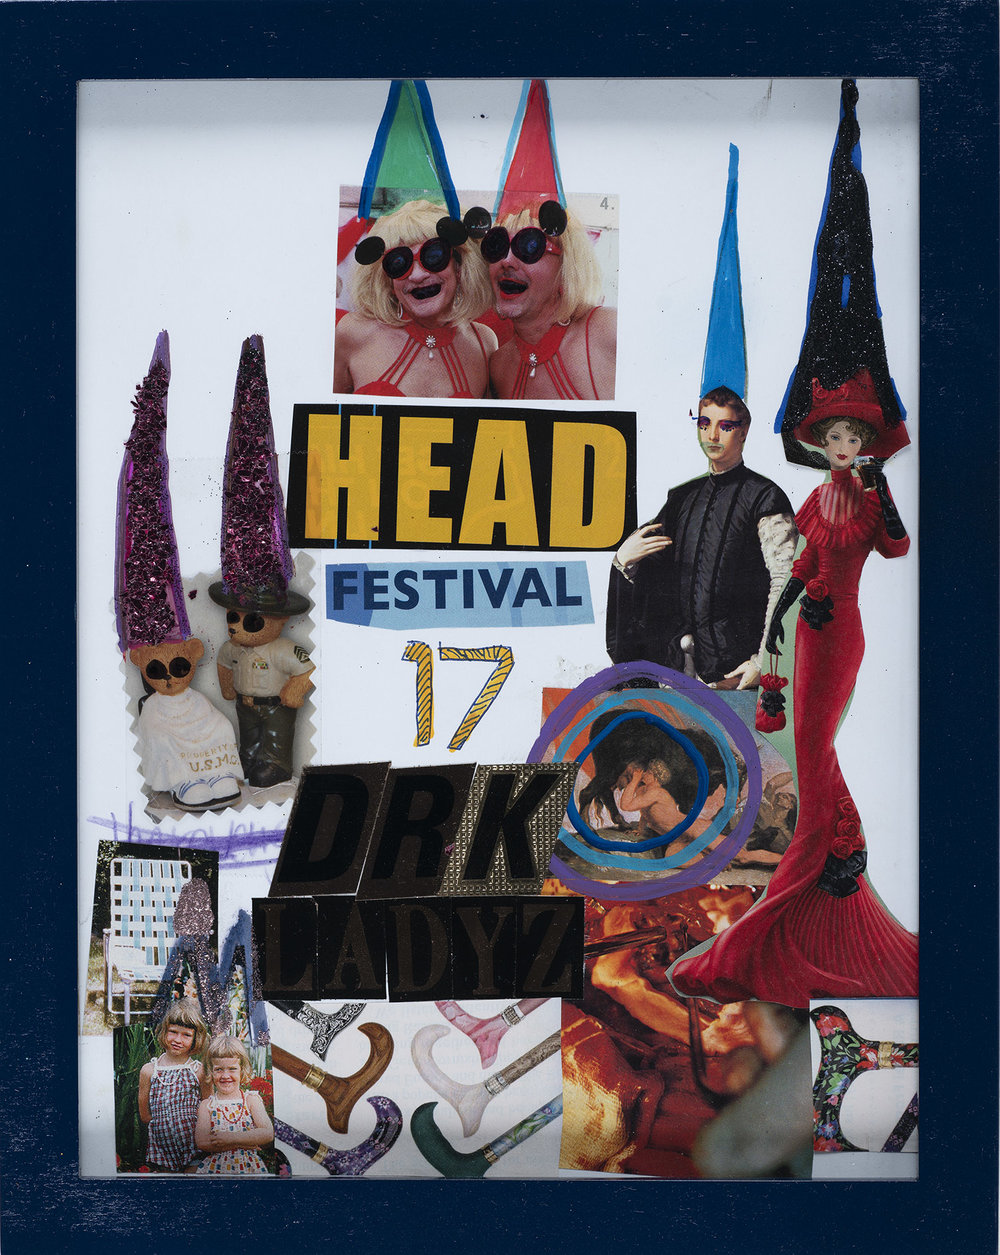 sweaterqueens_Head Festival 17 Drk Lady.jpg